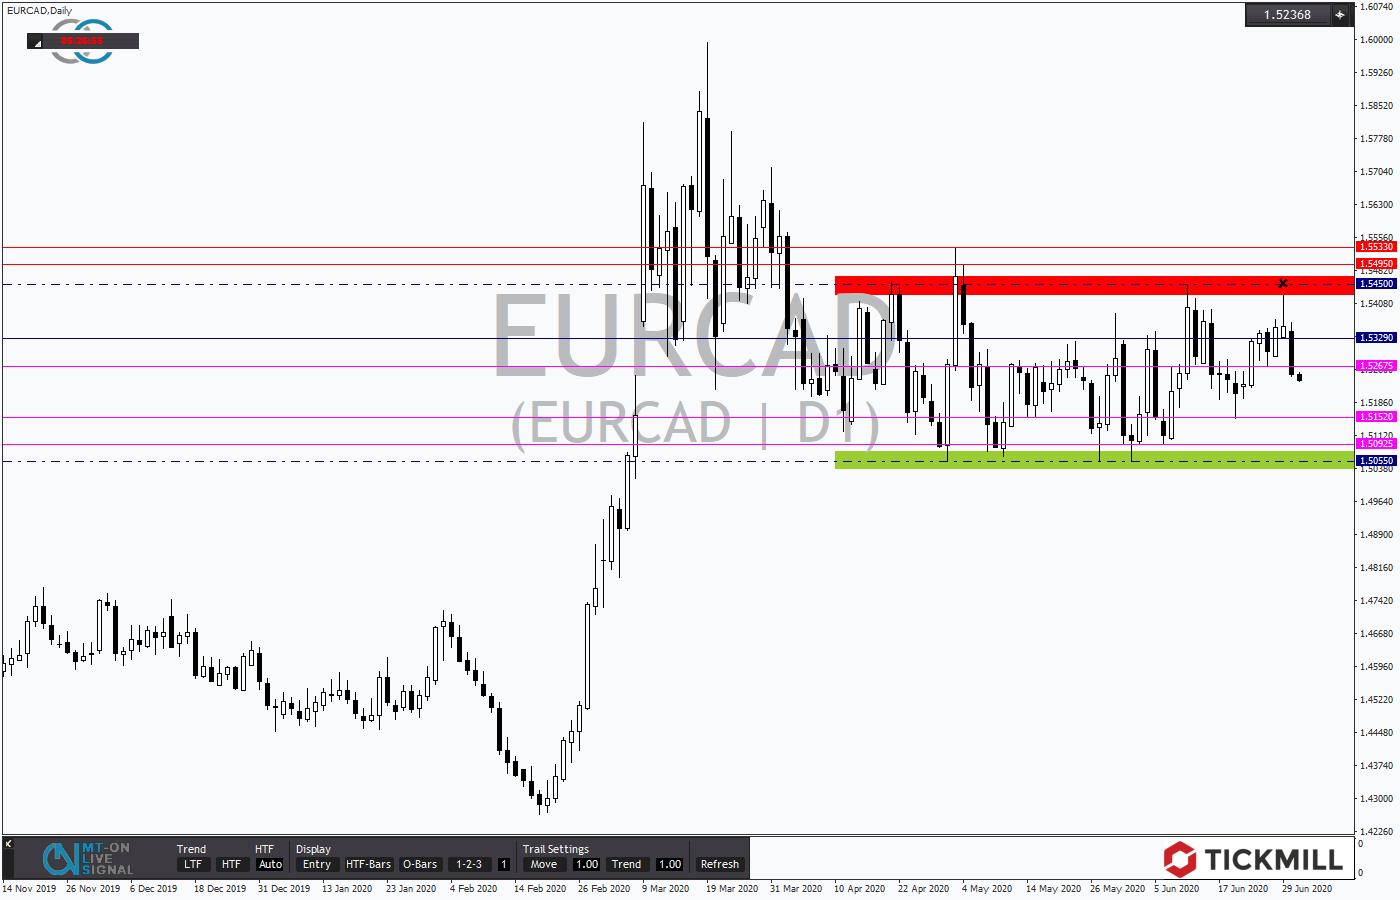 Tickmill-Analyse: EURCAD in Tradingrange